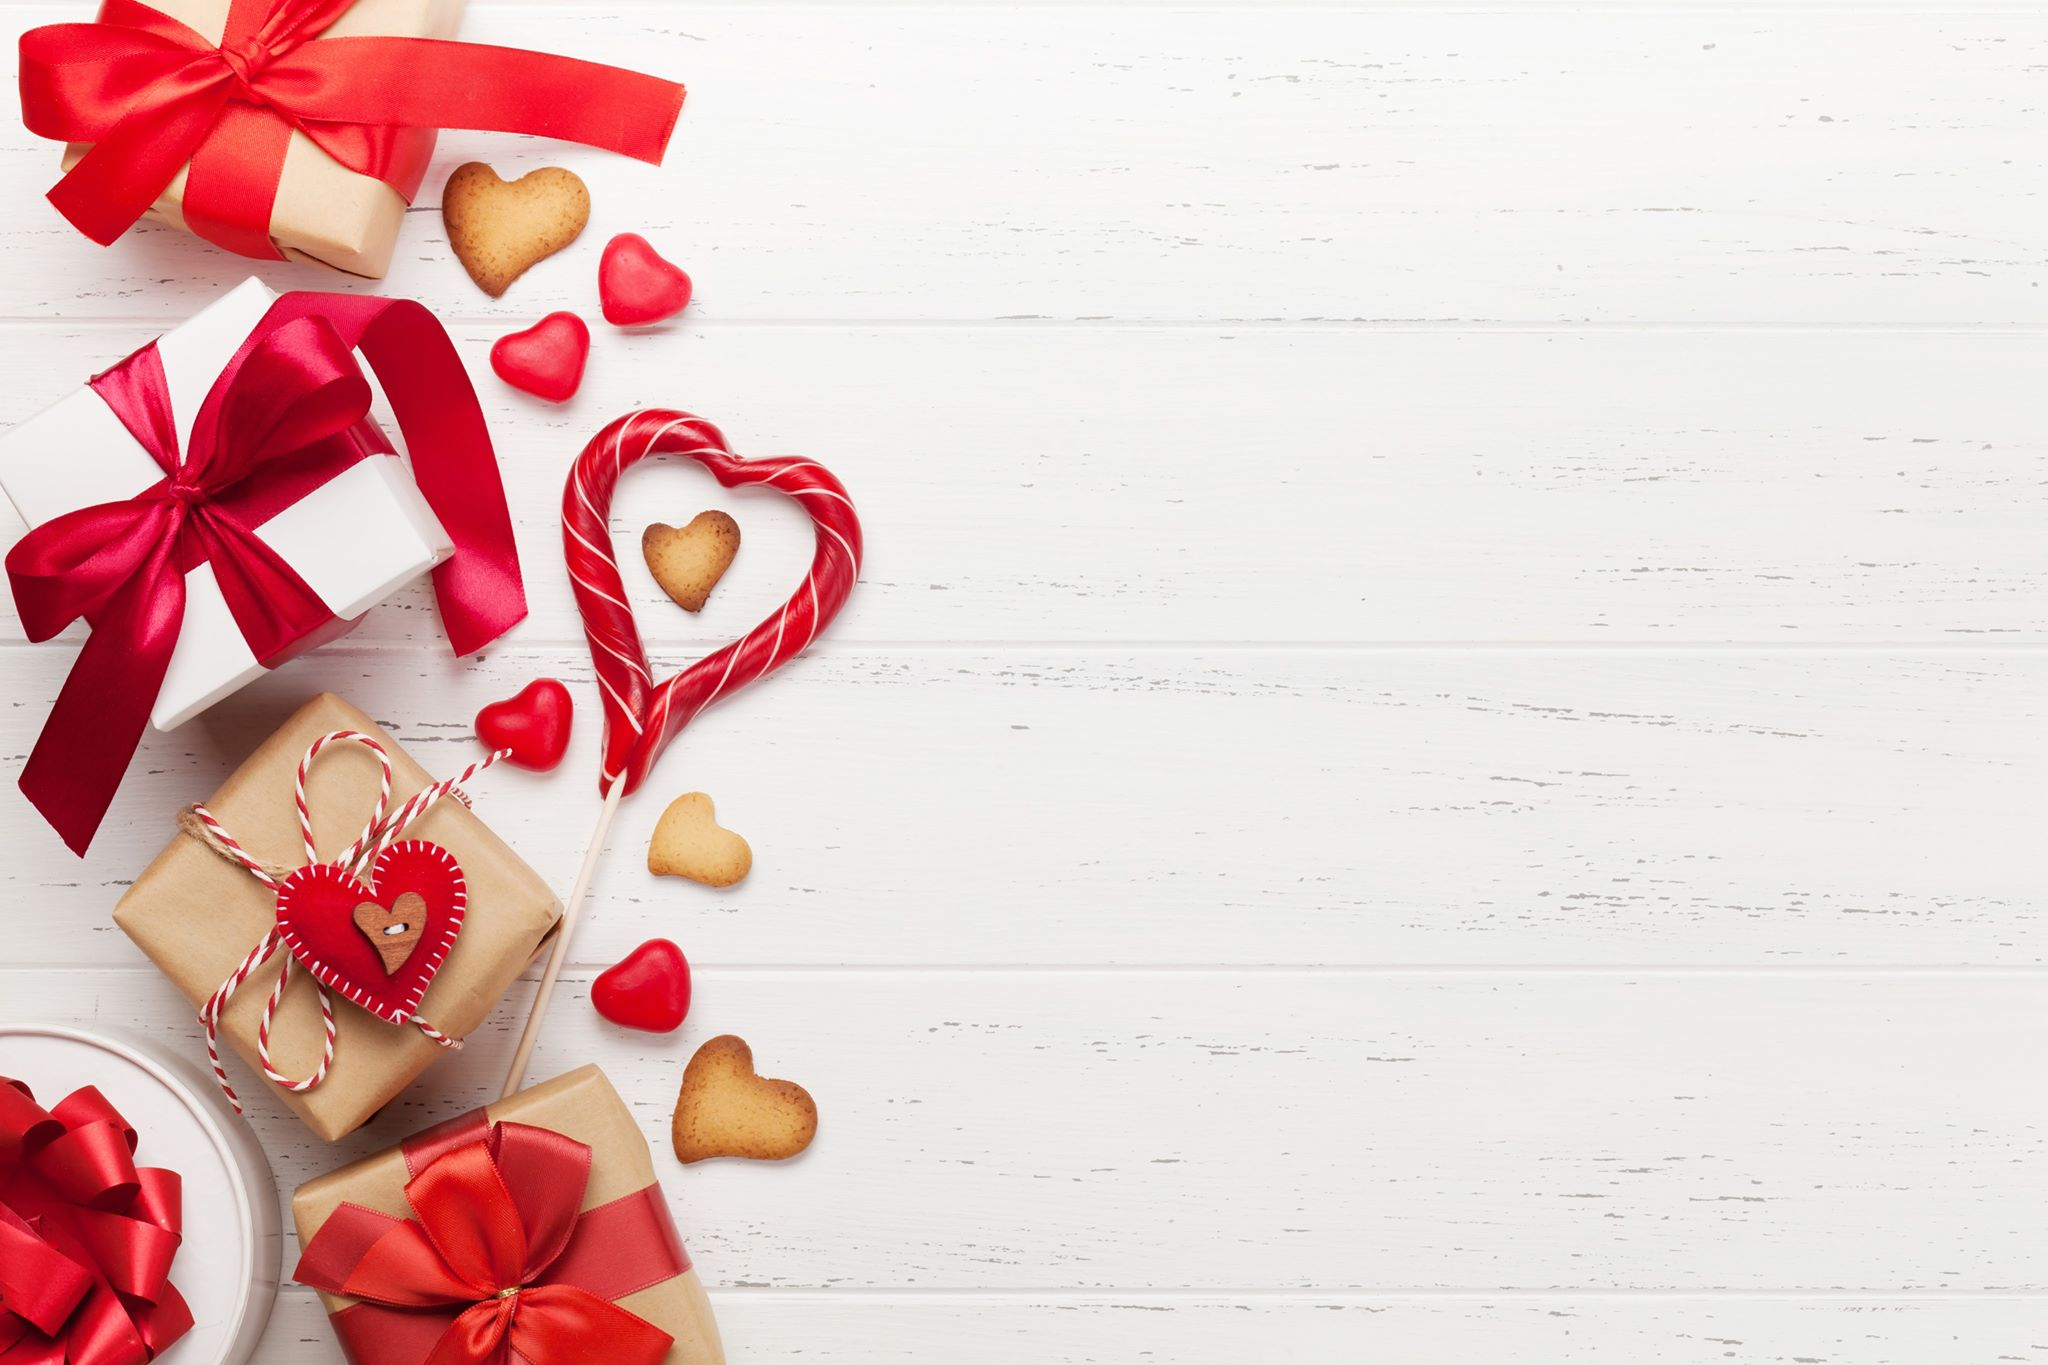 Valentines day images 22 صور عيد الحب